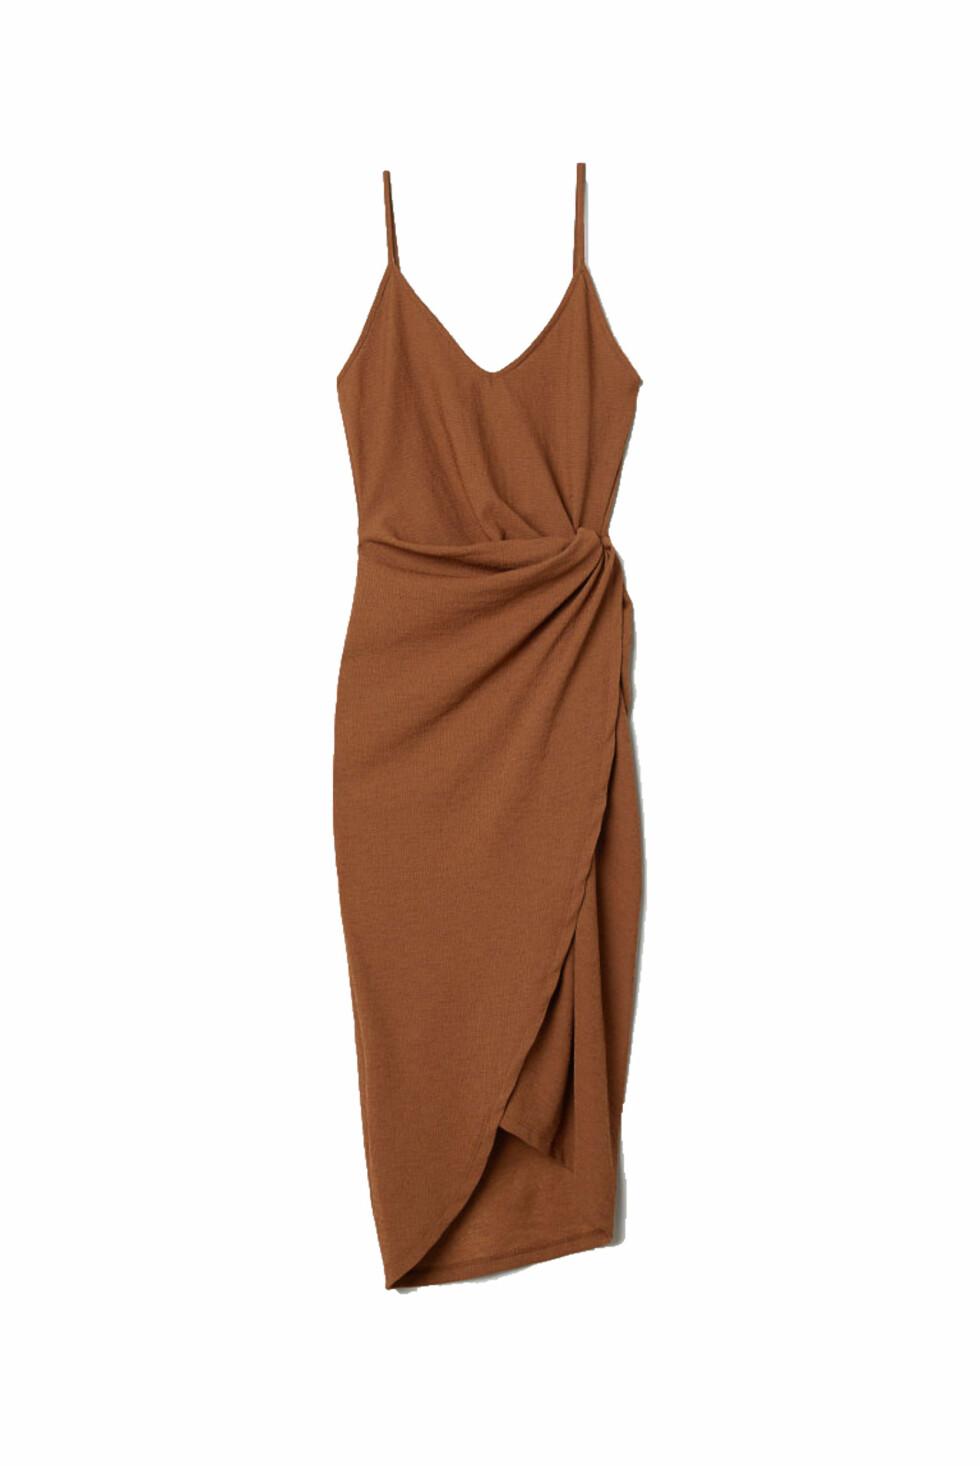 Kjole fra H&M |399,-| http://www2.hm.com/no_no/productpage.0676091009.html